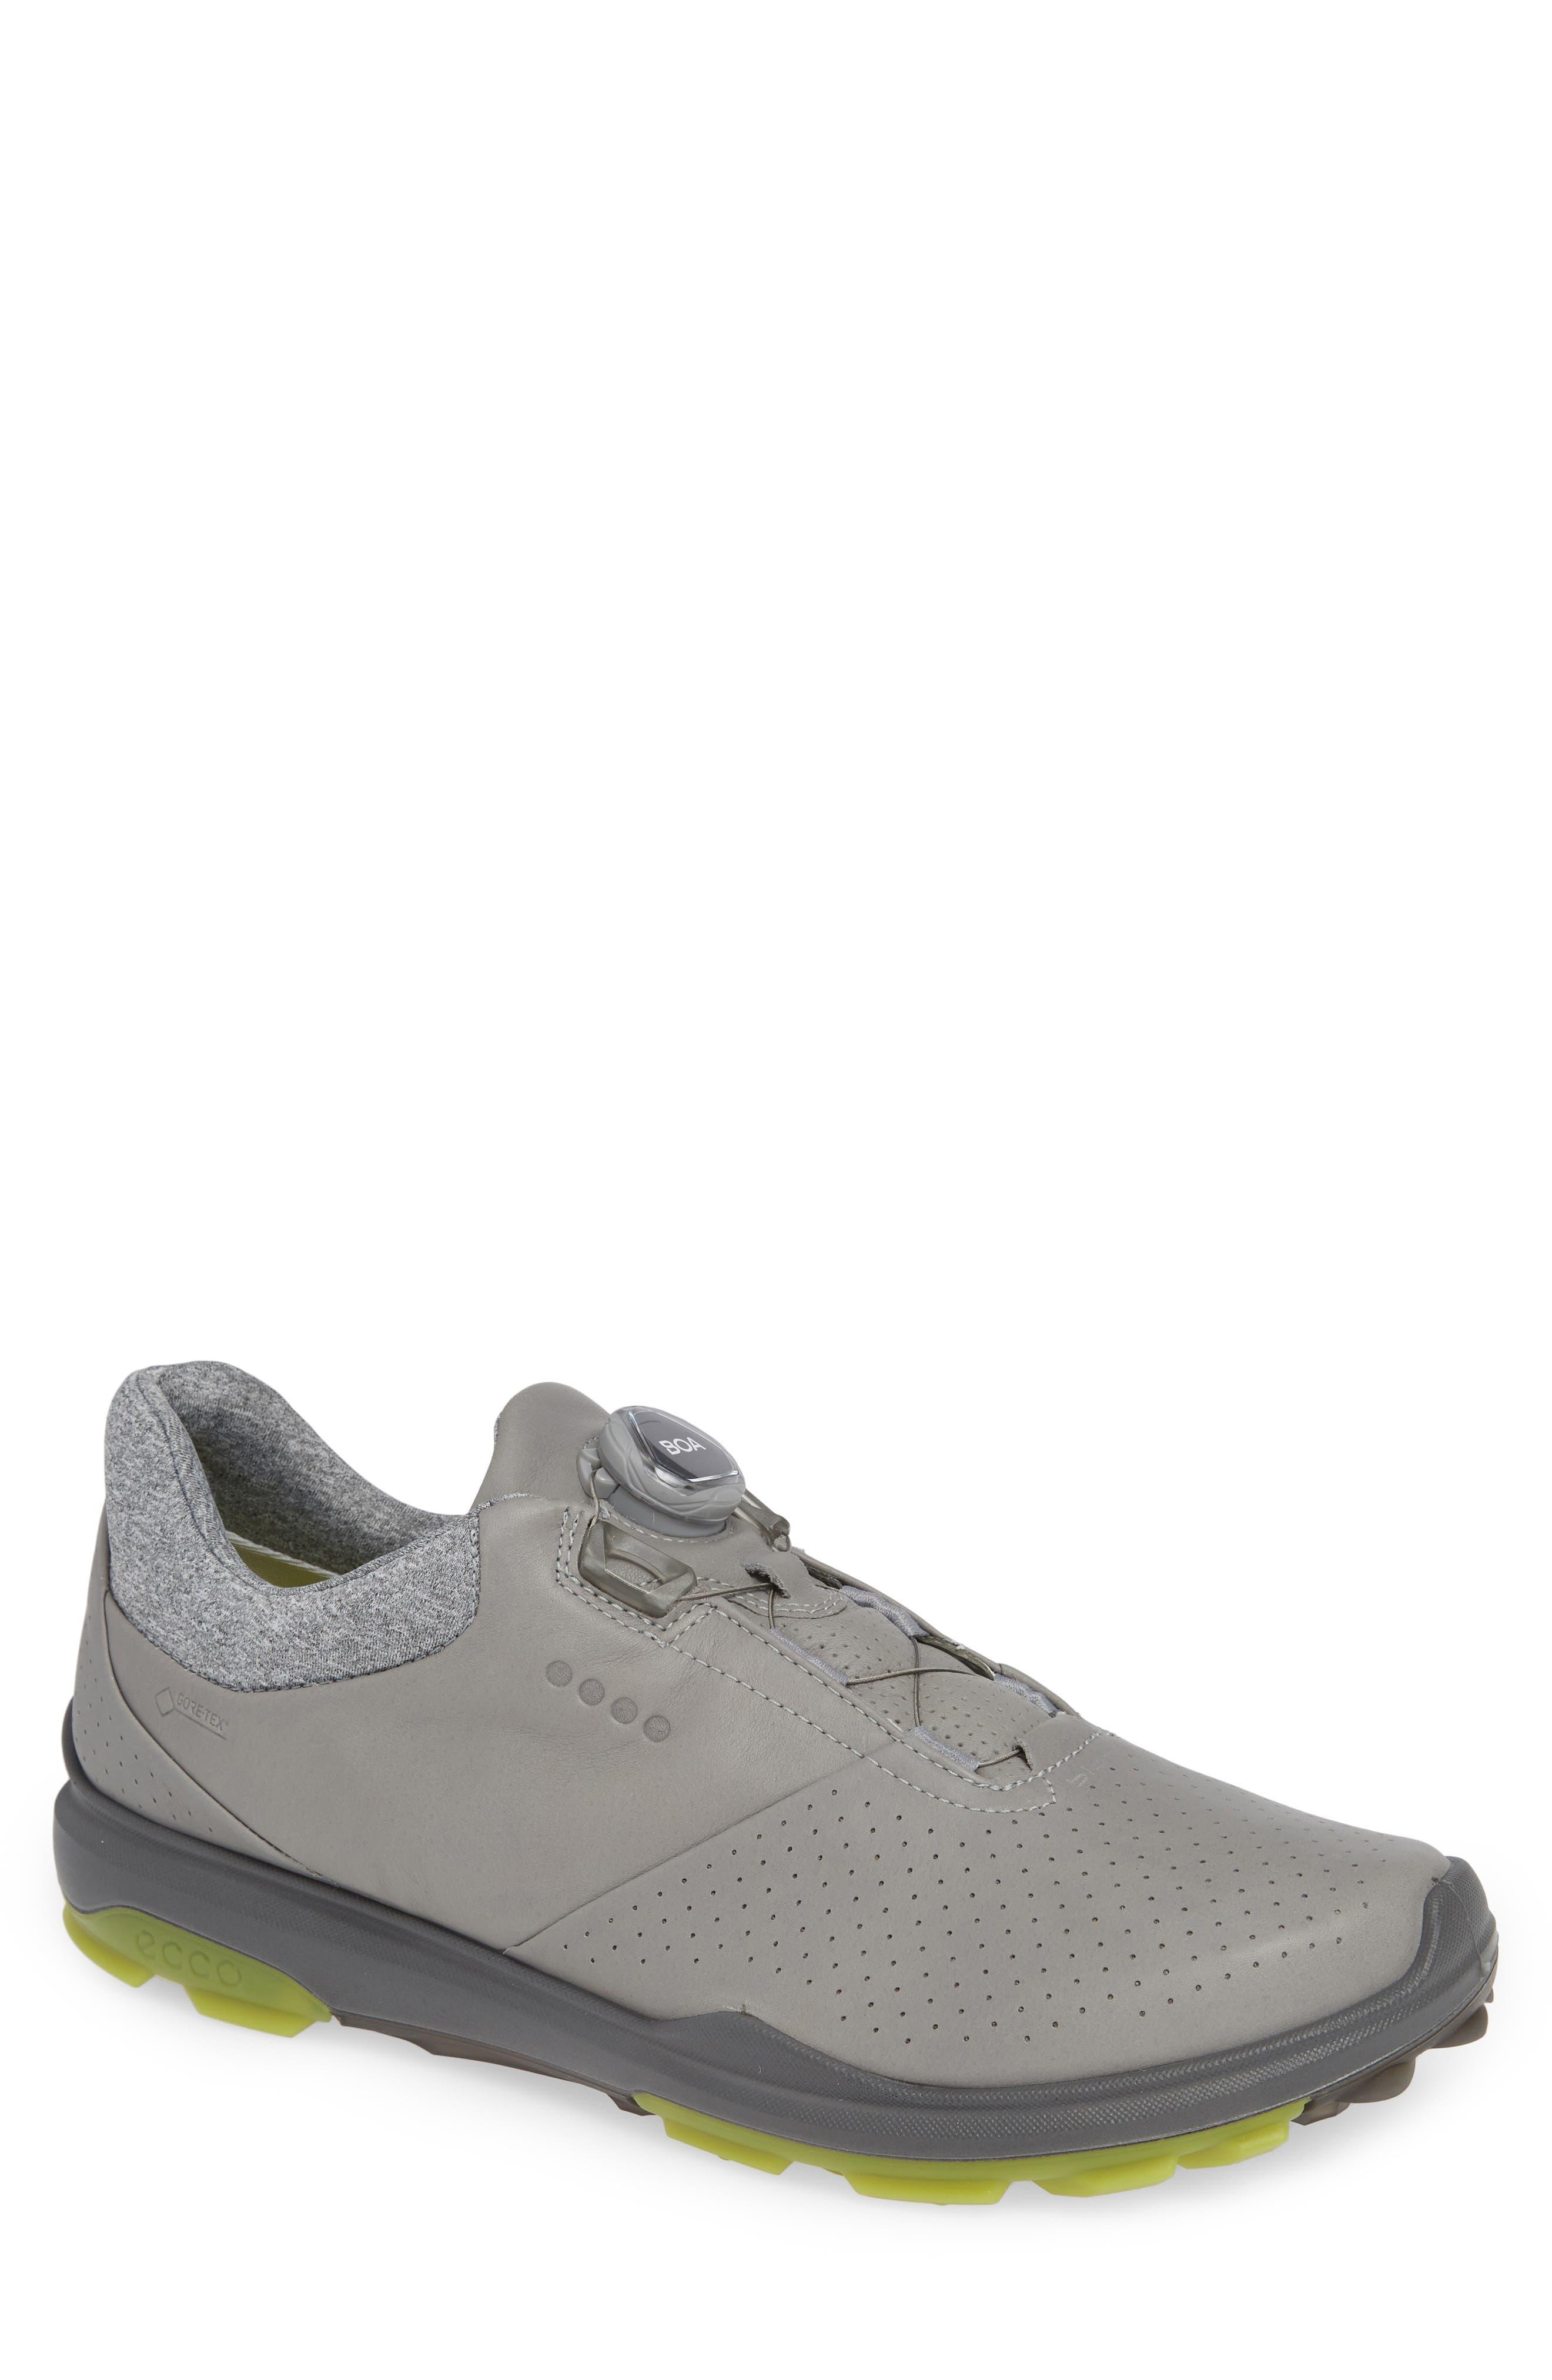 ECCO,                             BIOM Hybrid 3 Gore-Tex<sup>®</sup> Golf Shoe,                             Main thumbnail 1, color,                             WILD DOVE/ KIWI LEATHER